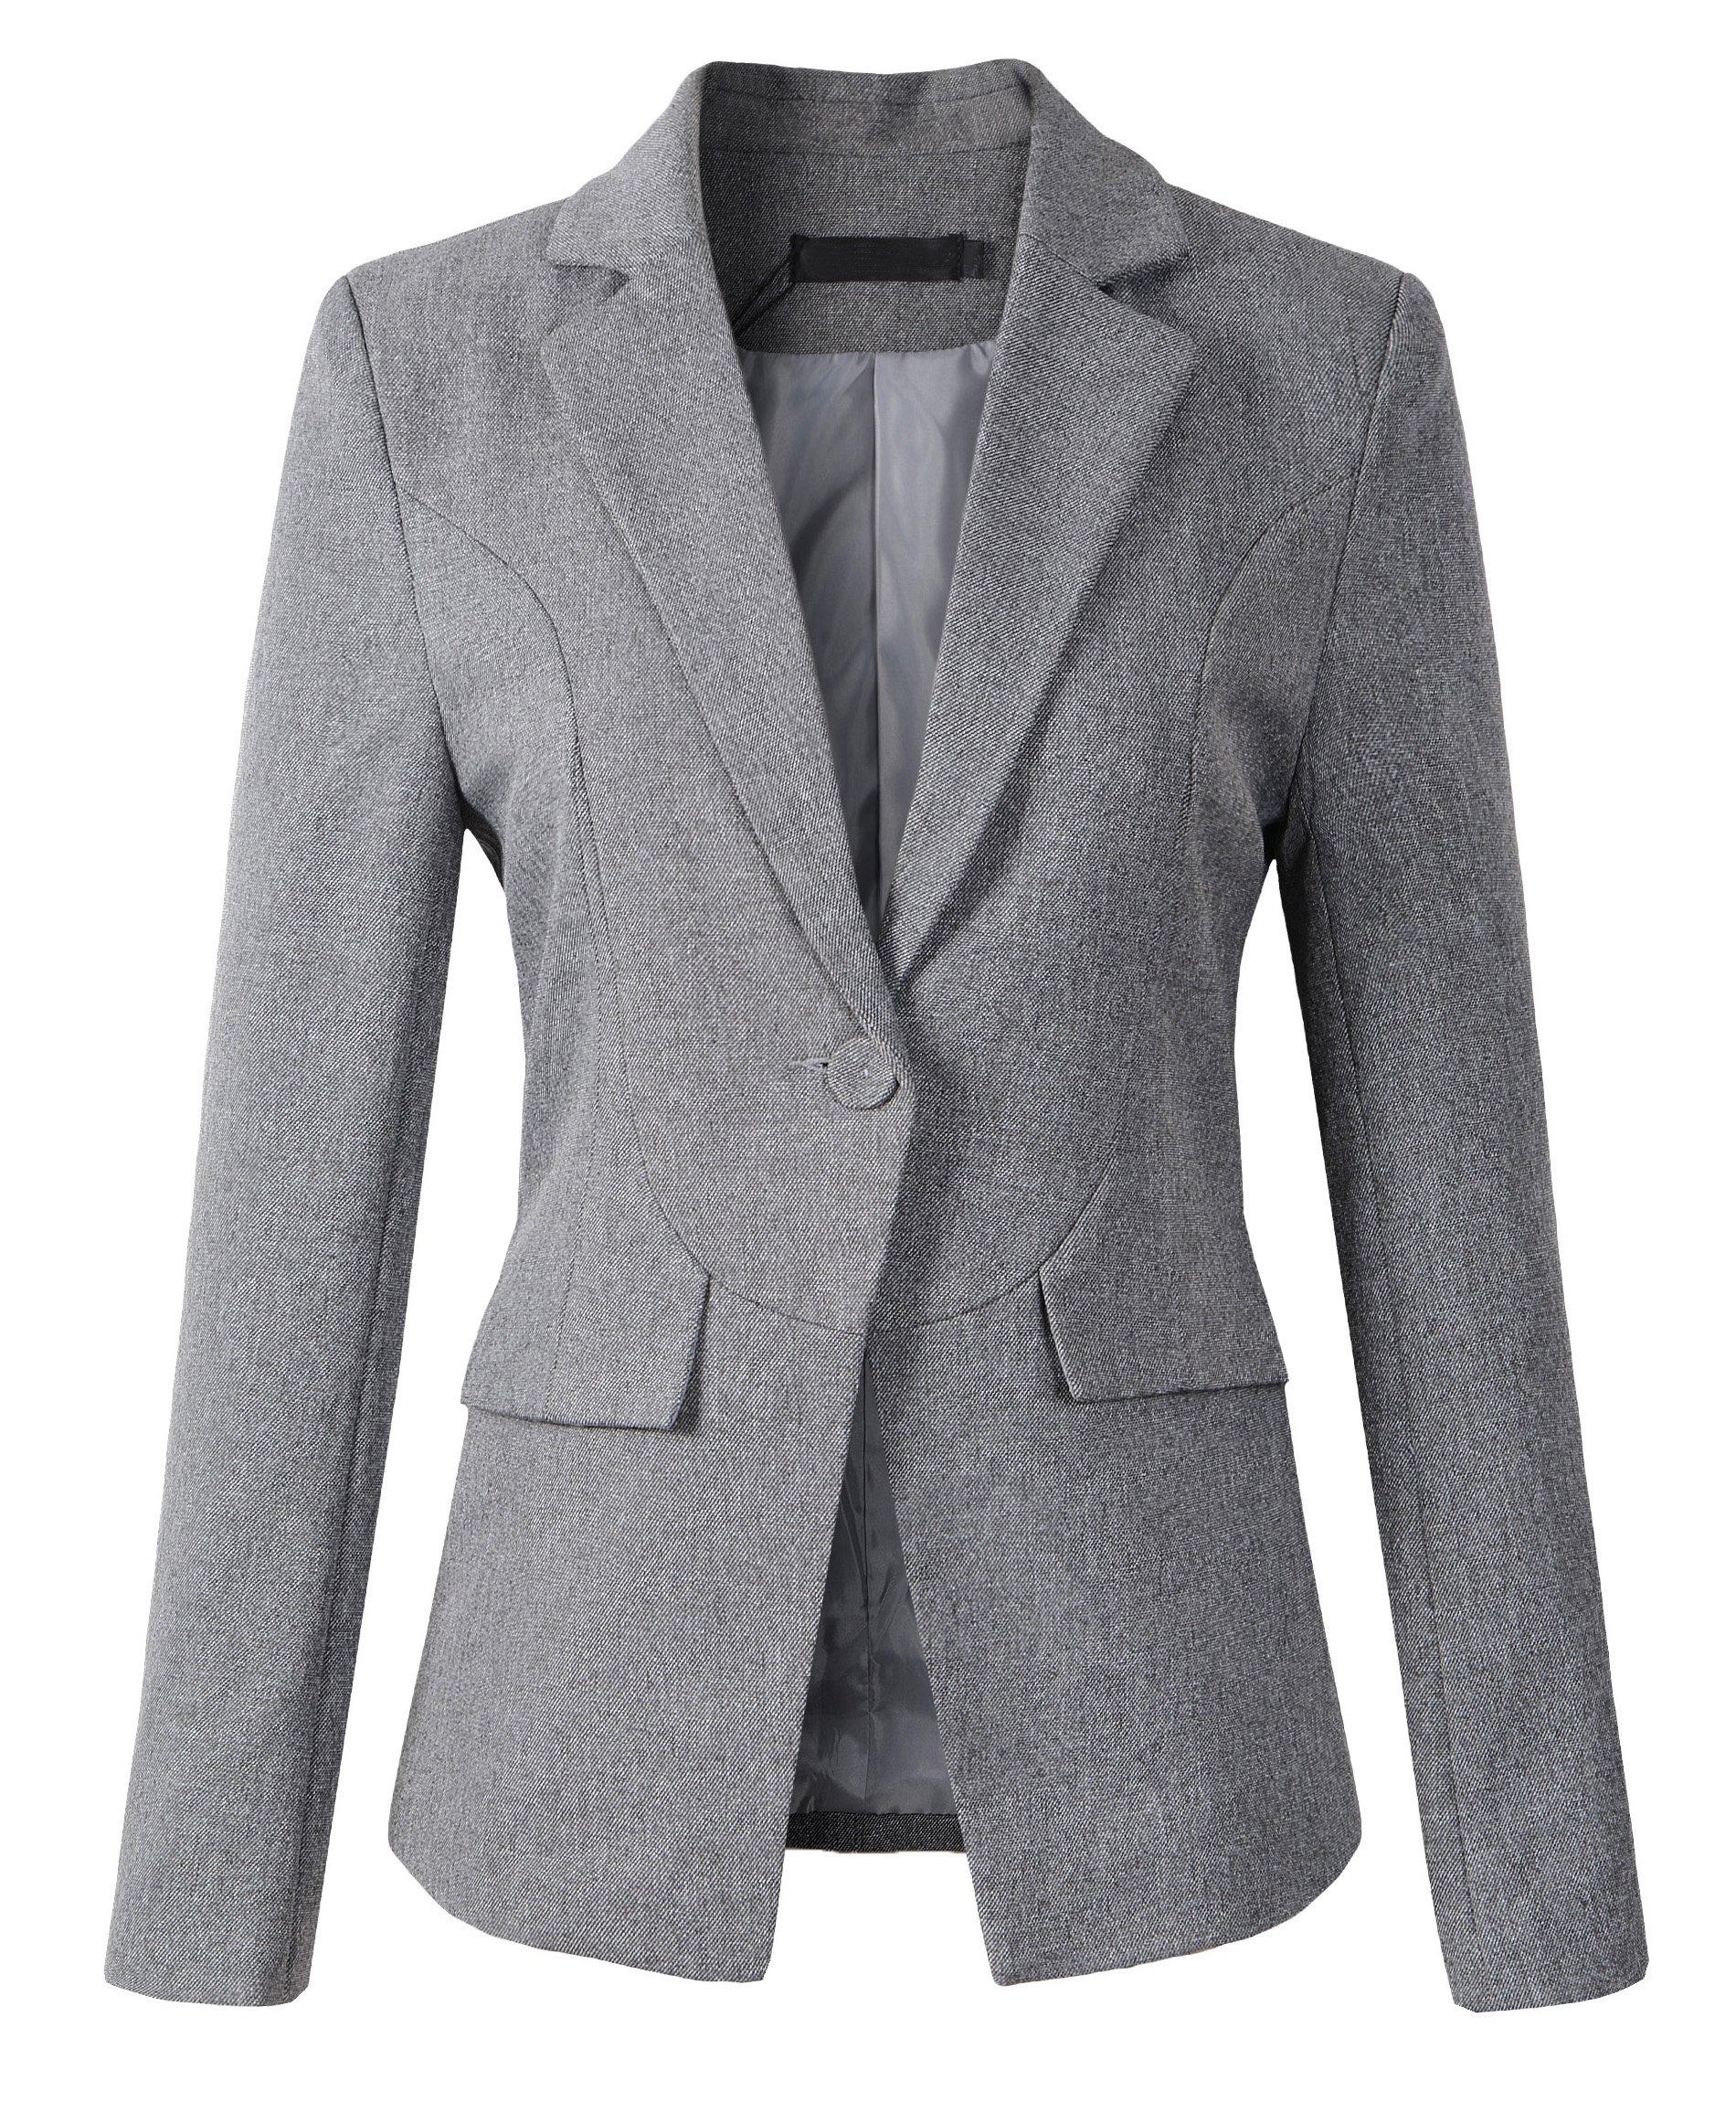 Womens Formal One Button Boyfriend Blazer Jacket (Large, 1513Grey)